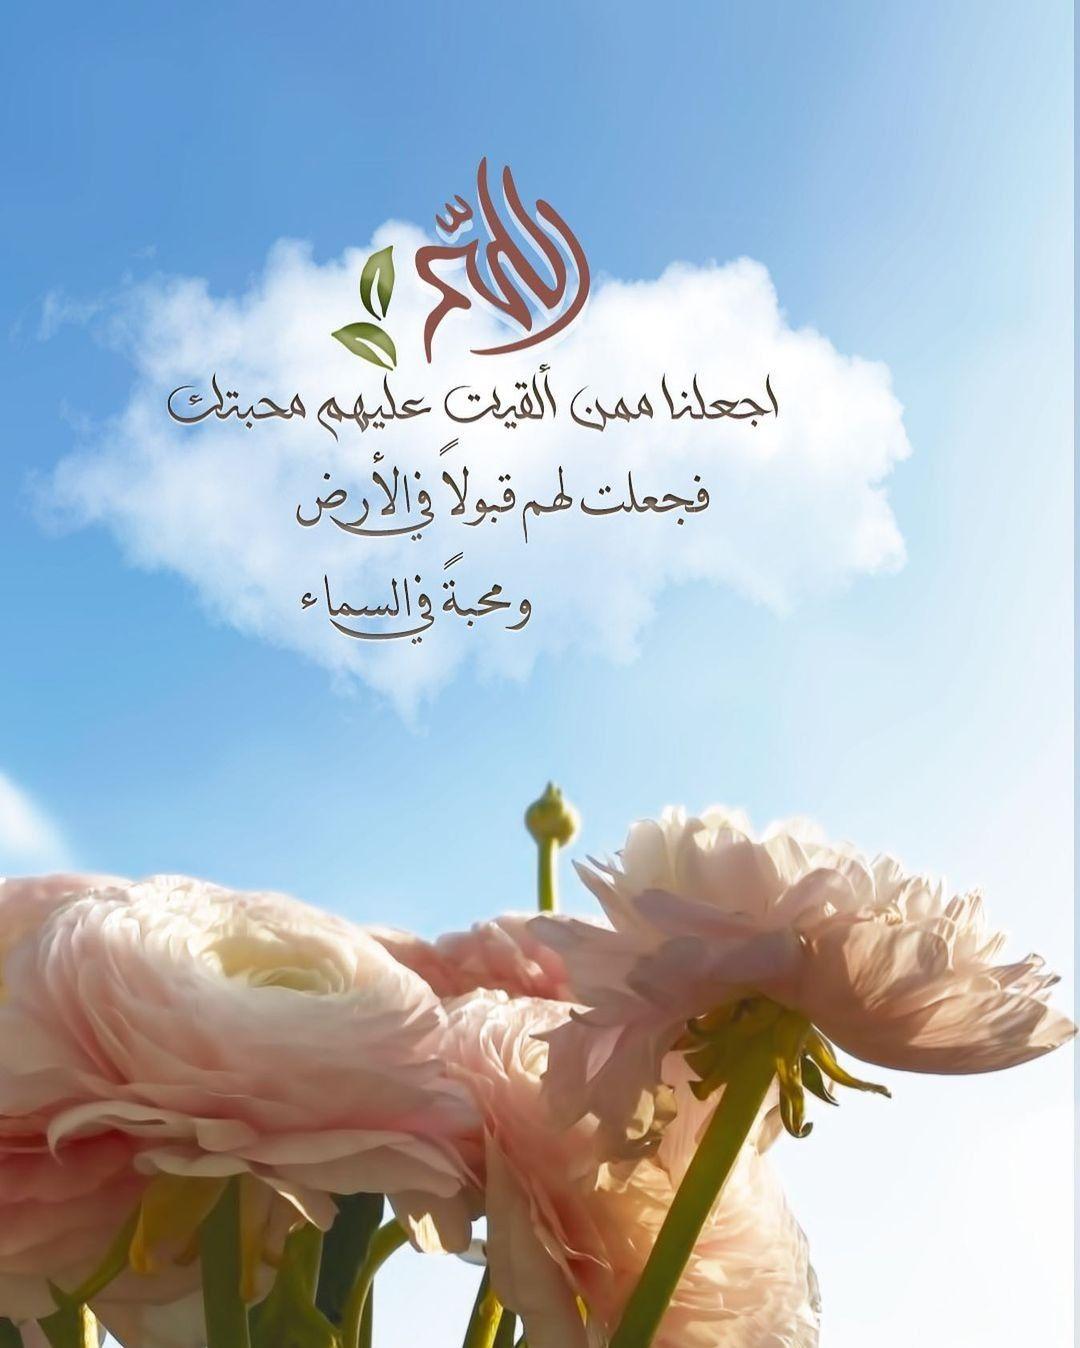 Pin By Asmaa Ammar On Duea دعاء In 2021 Good Morning Images Flowers Ramadan Greetings Instagram